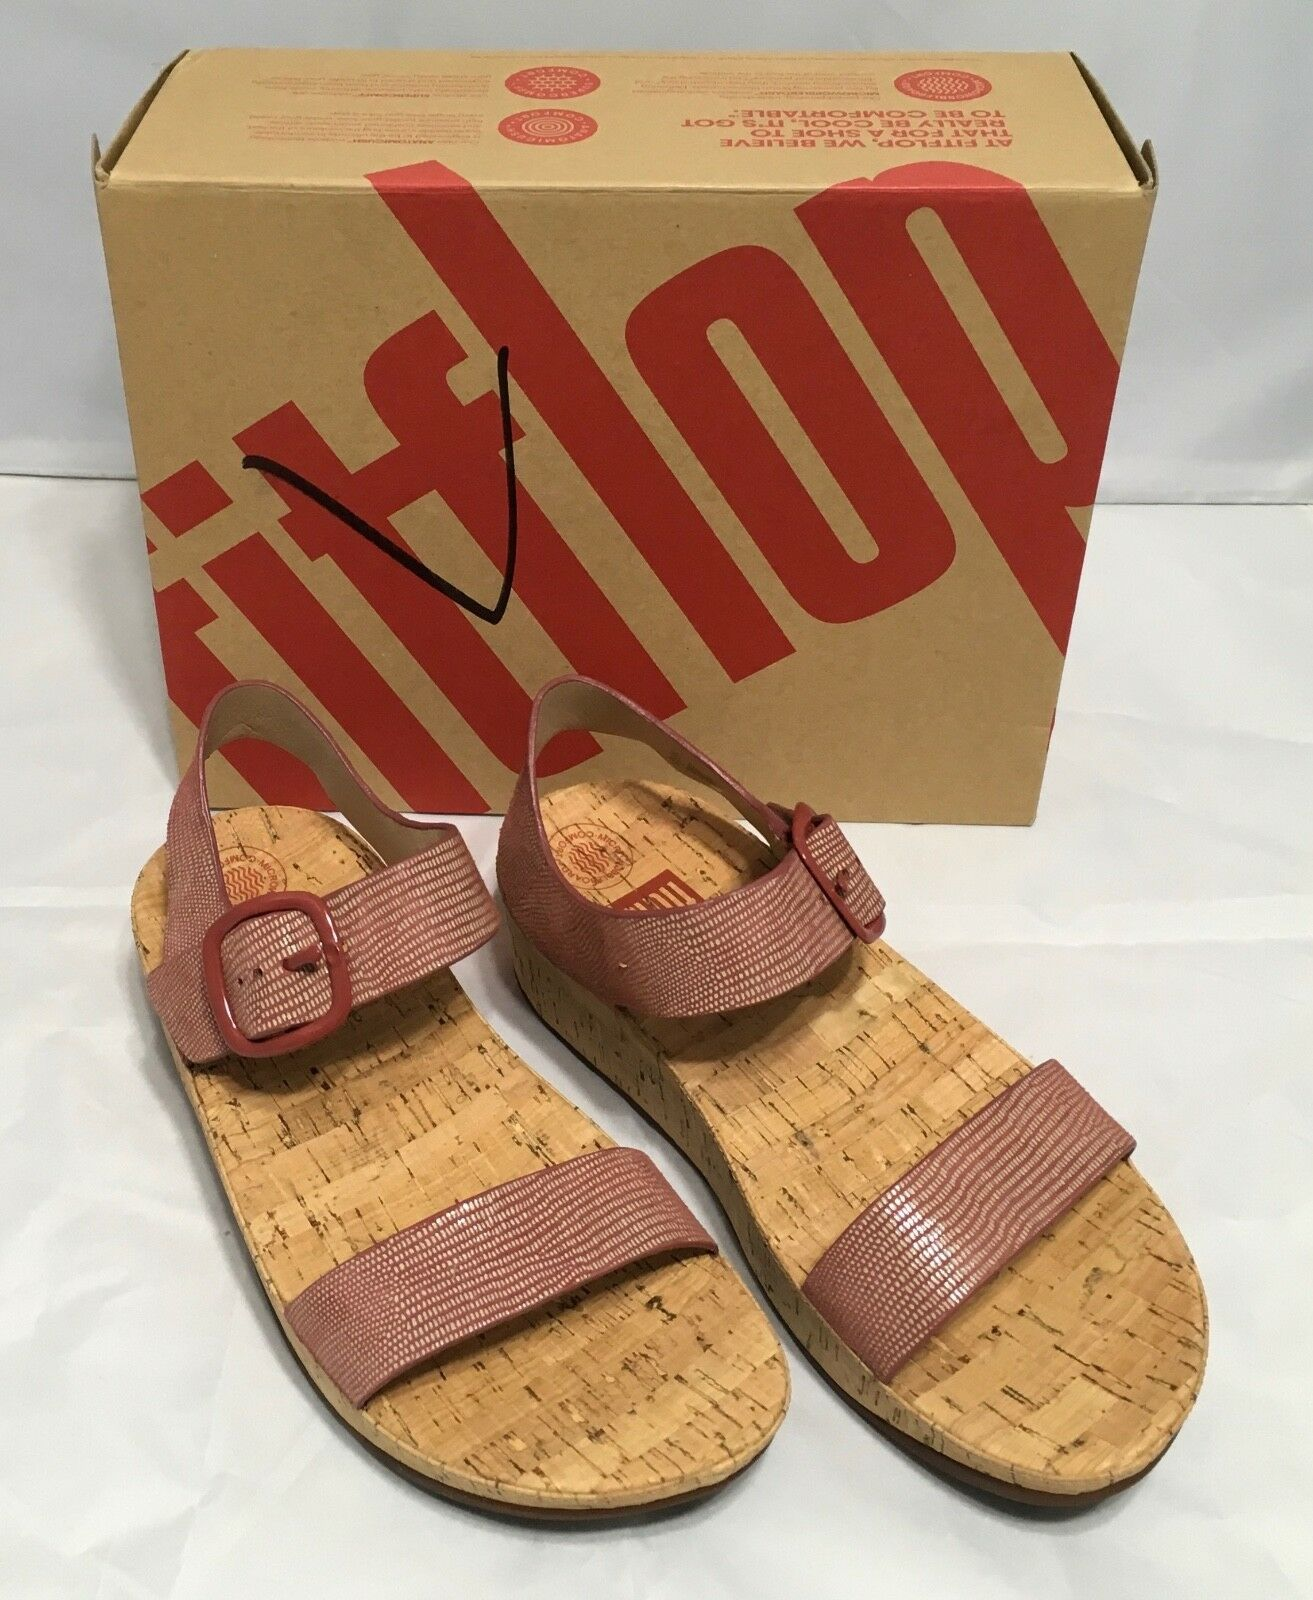 FitFlop Women's Shoes BON  Lizard Print Sandals Spice Size 7 9 10  NIB